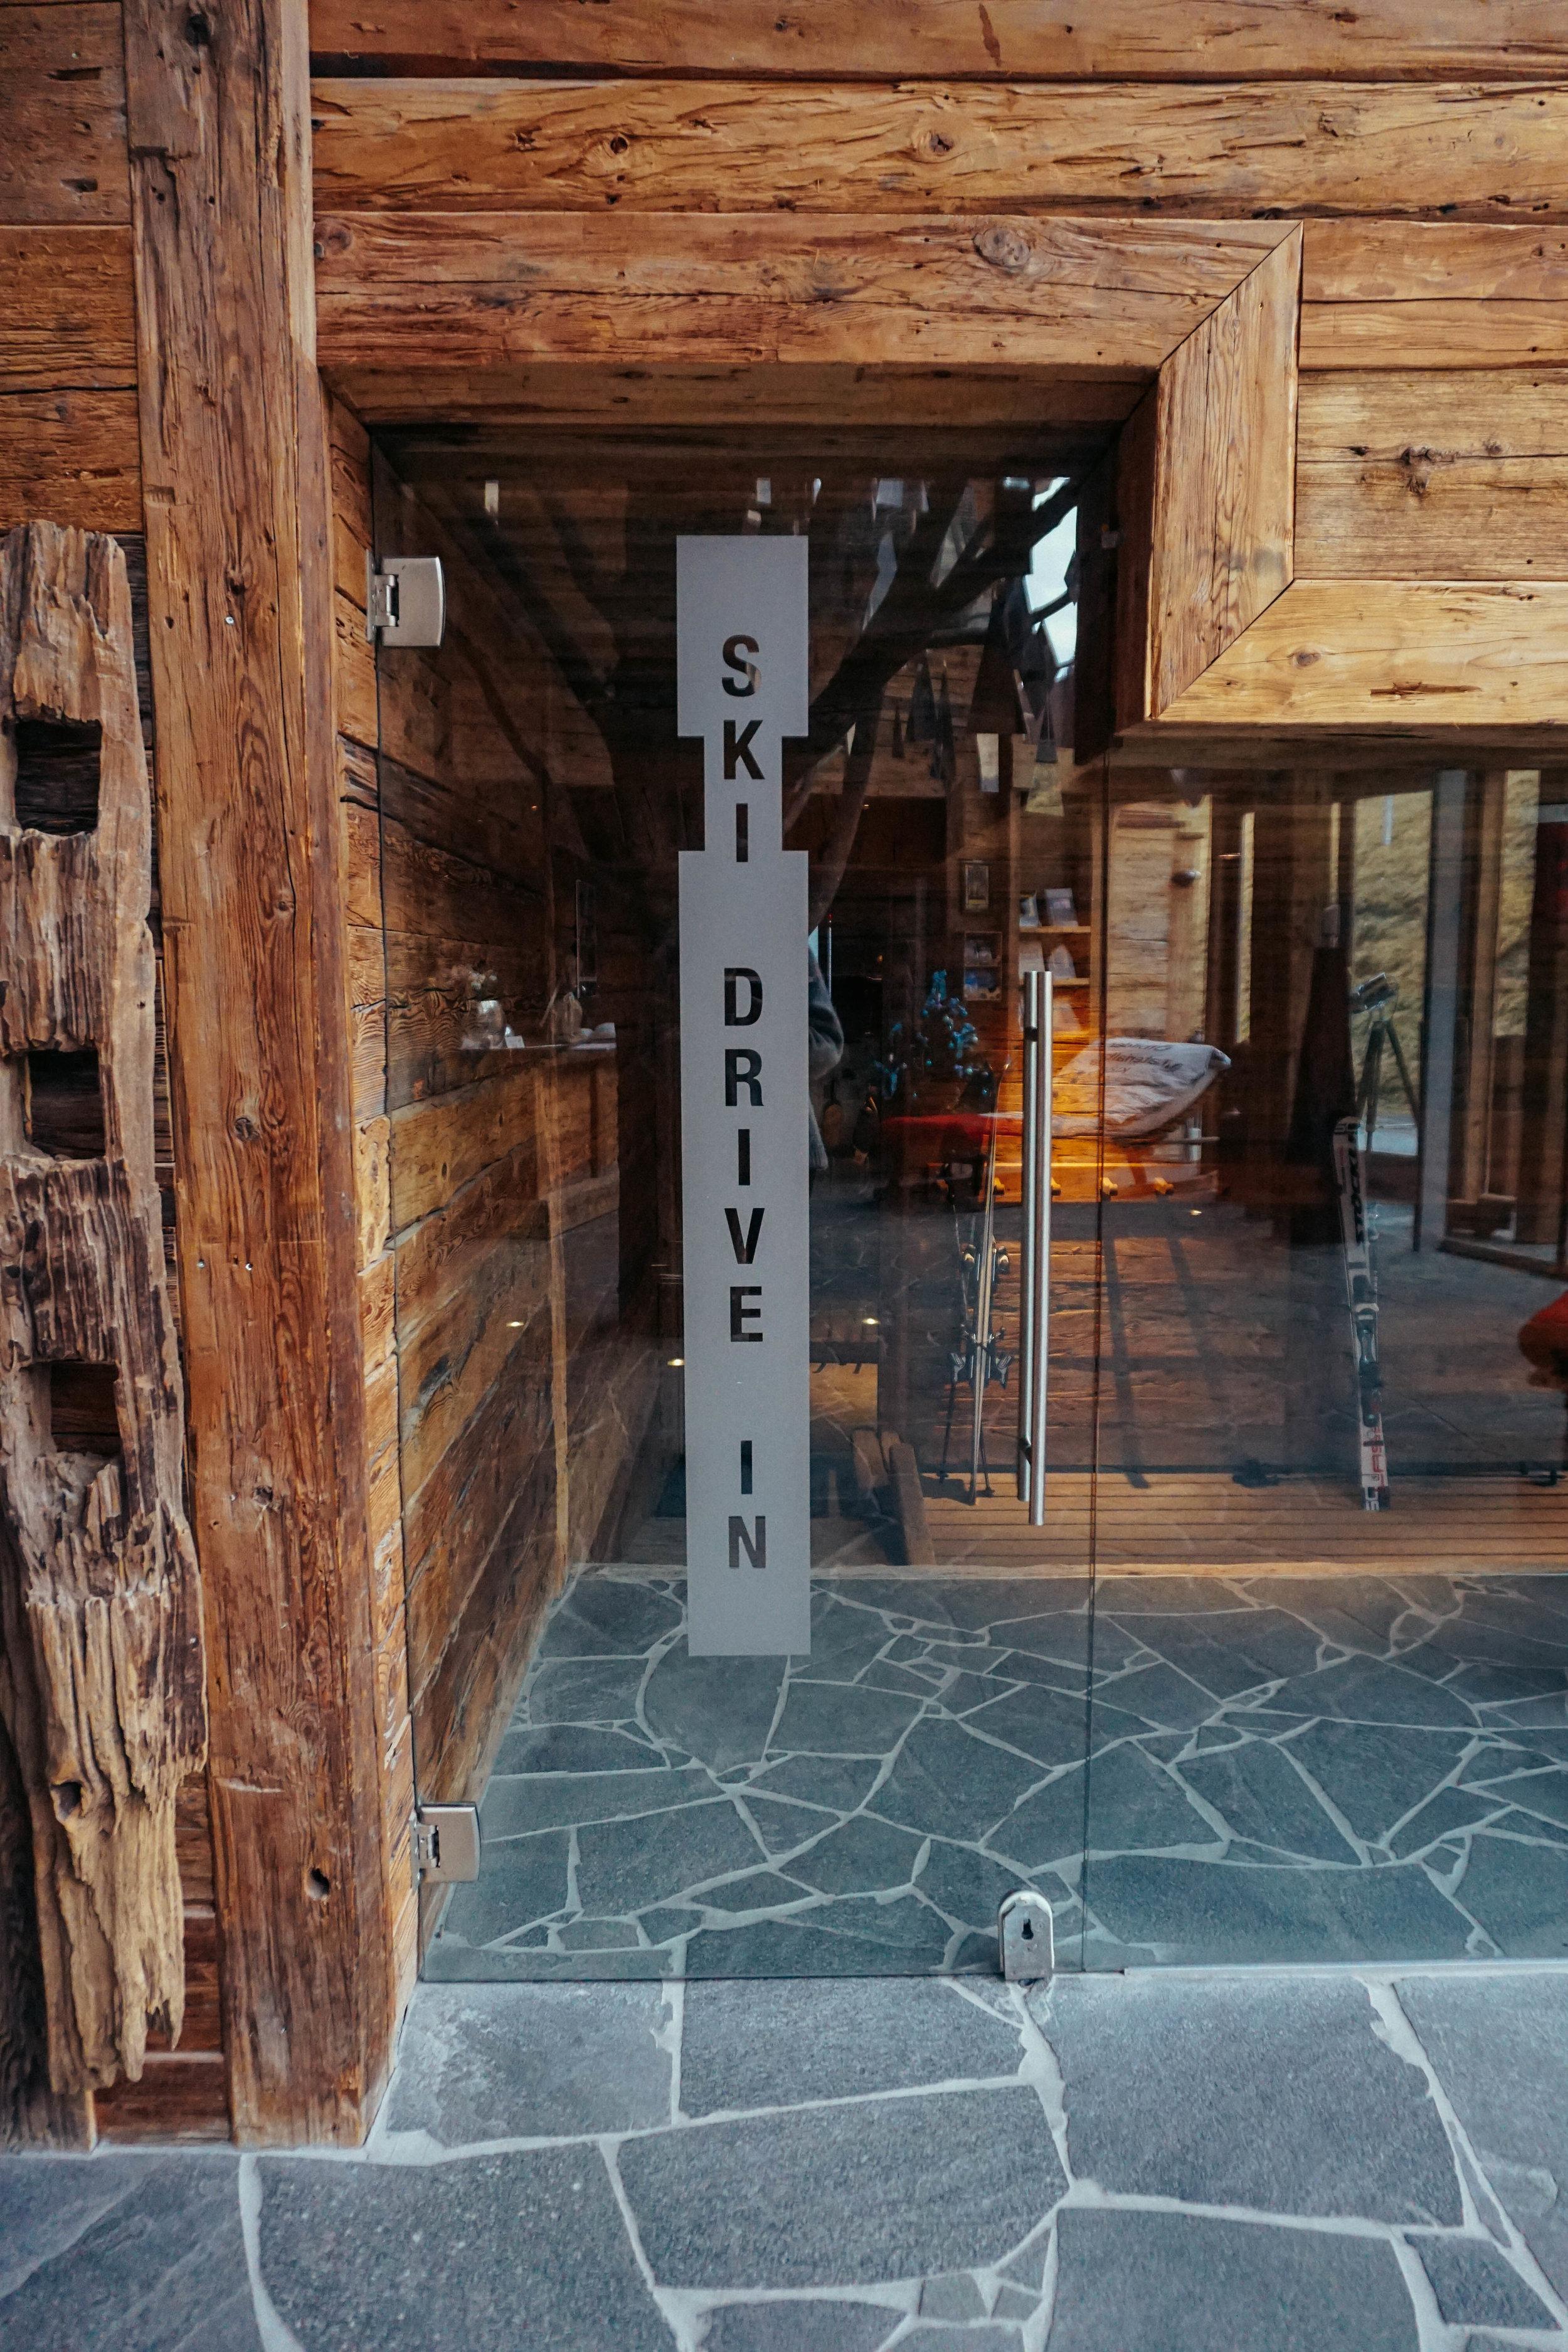 Hotel Art & Ski in Hinterhag, Saalbach Hinterglemm, Austria